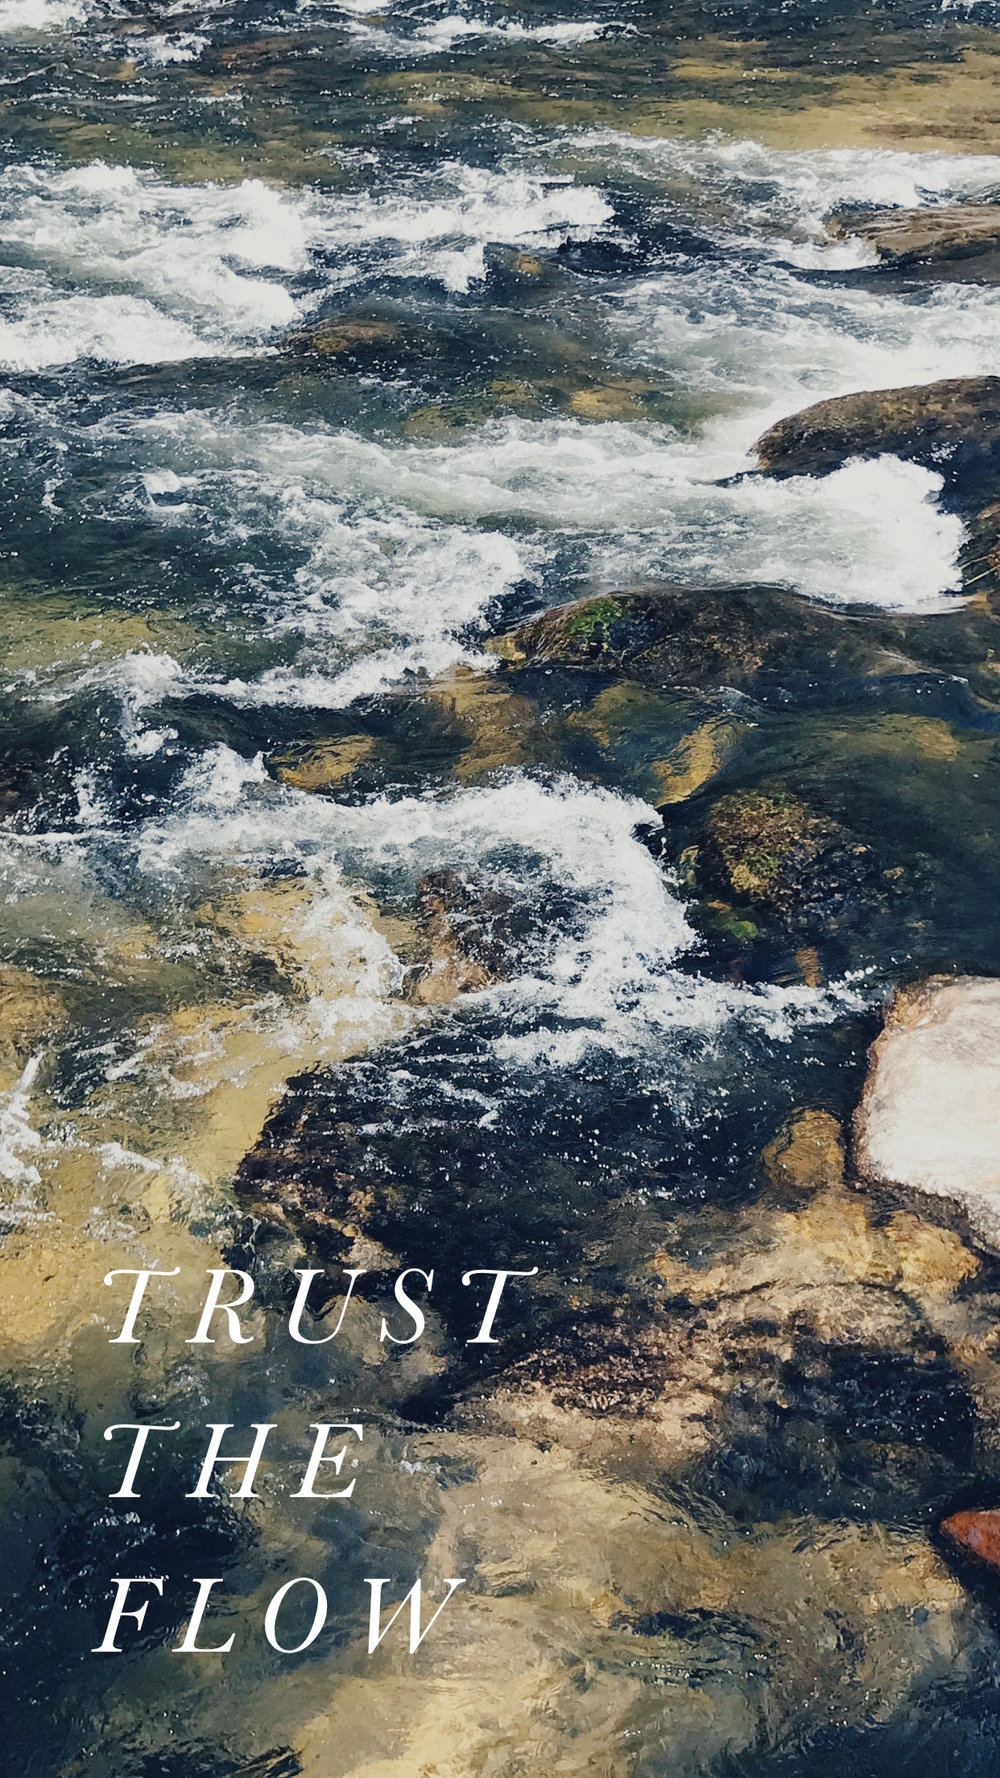 trust-the-flow-wallpaper